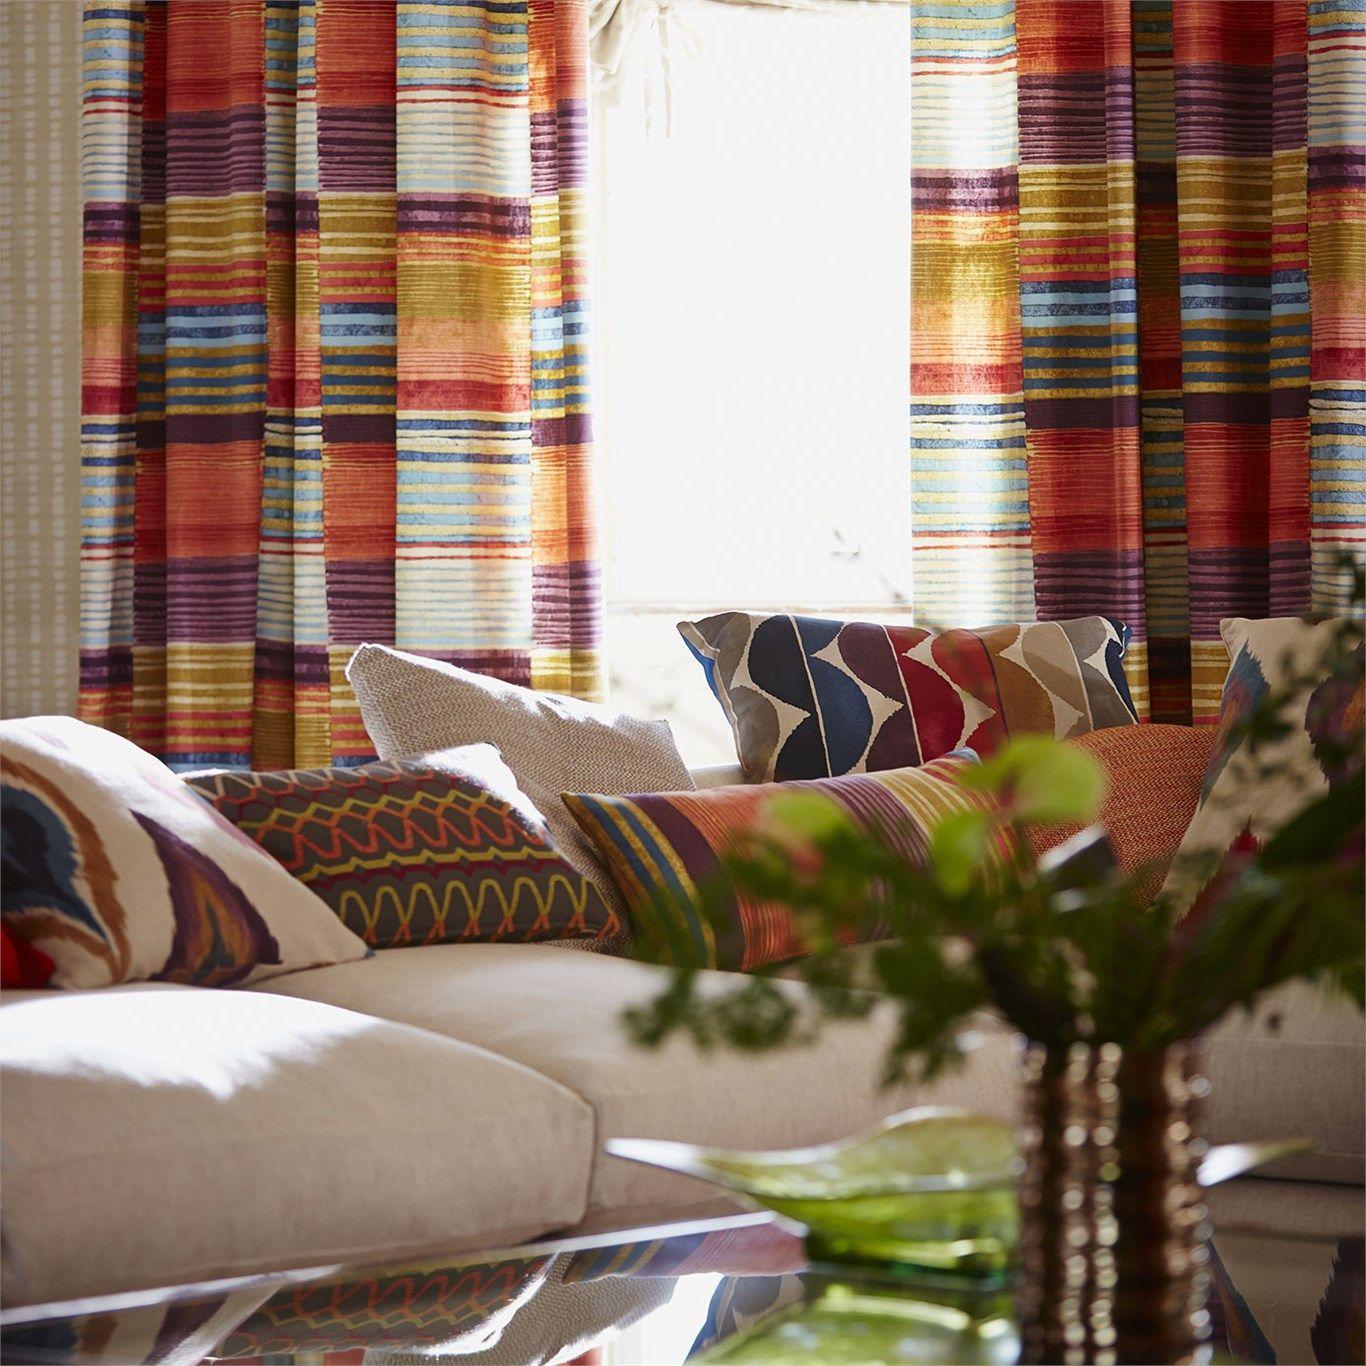 Products harlequin designer fabrics and wallpapers paradise - Scion Designer Fabric And Wallpapers Products Medini Nspi120314 Spirit Fabrics